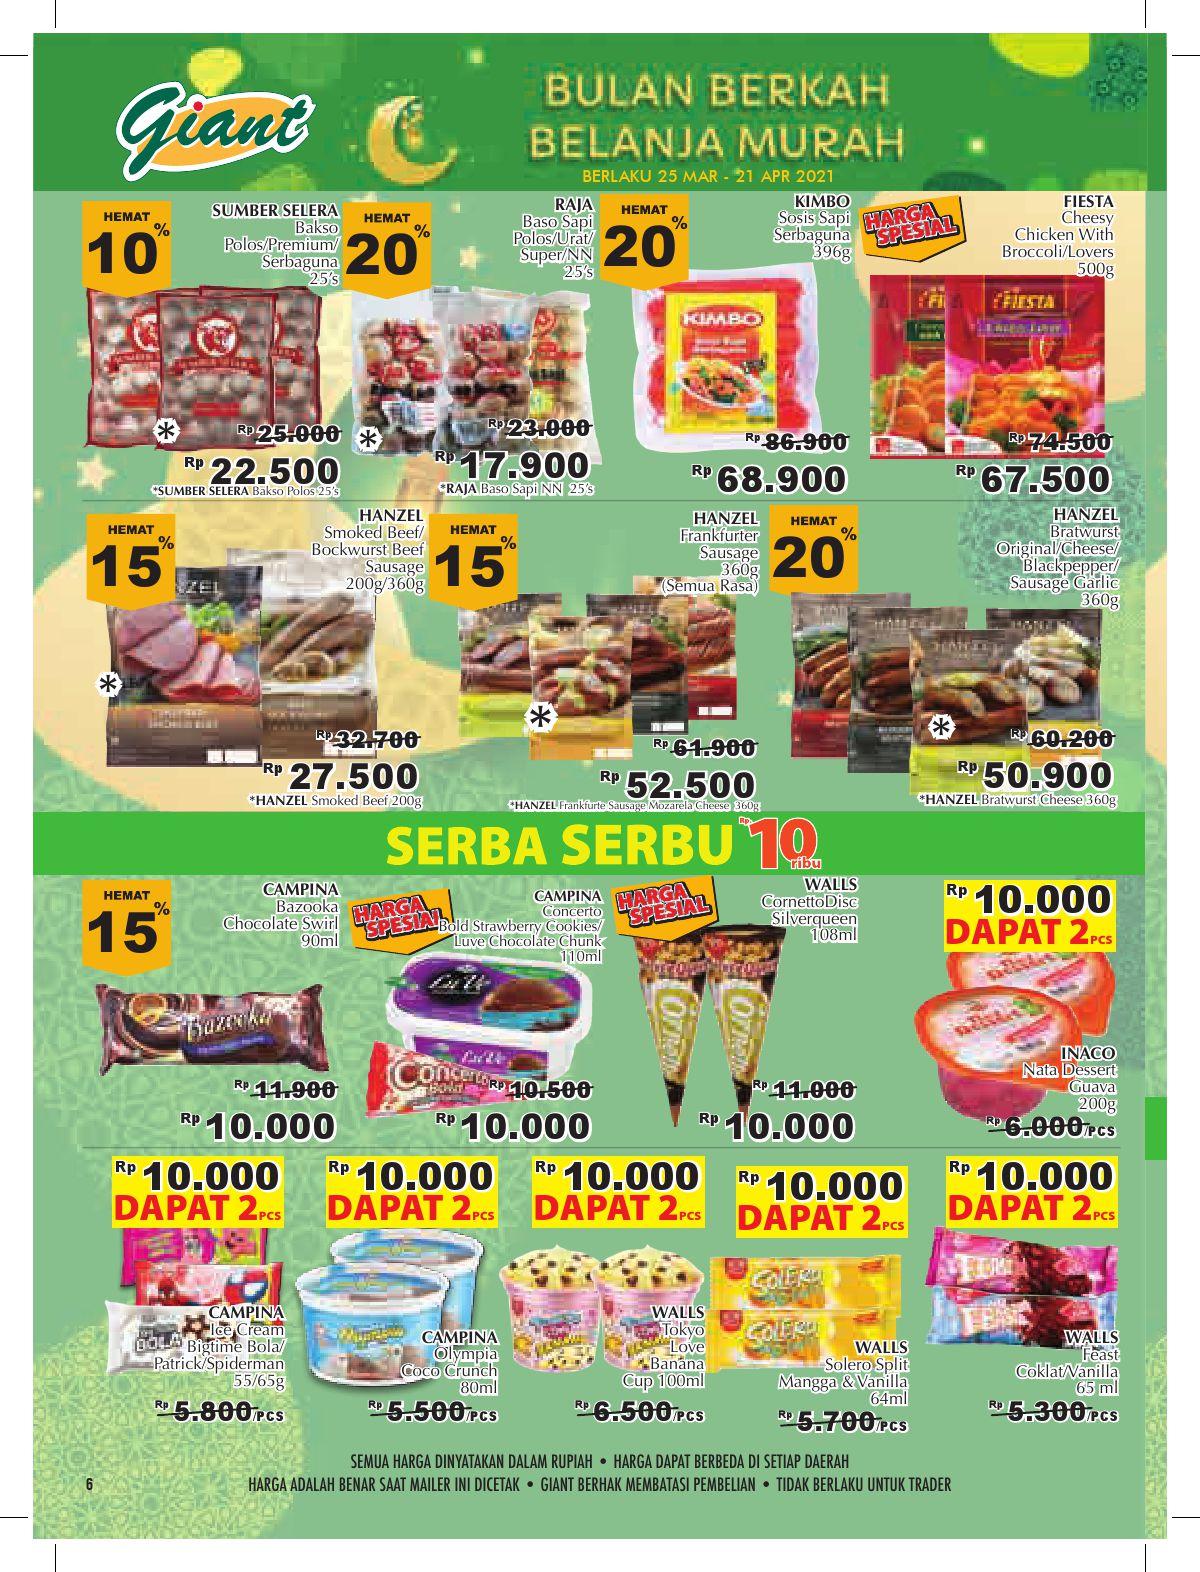 Katalog Promo Giant Terbaru periode 25 Maret - 21 April 2021